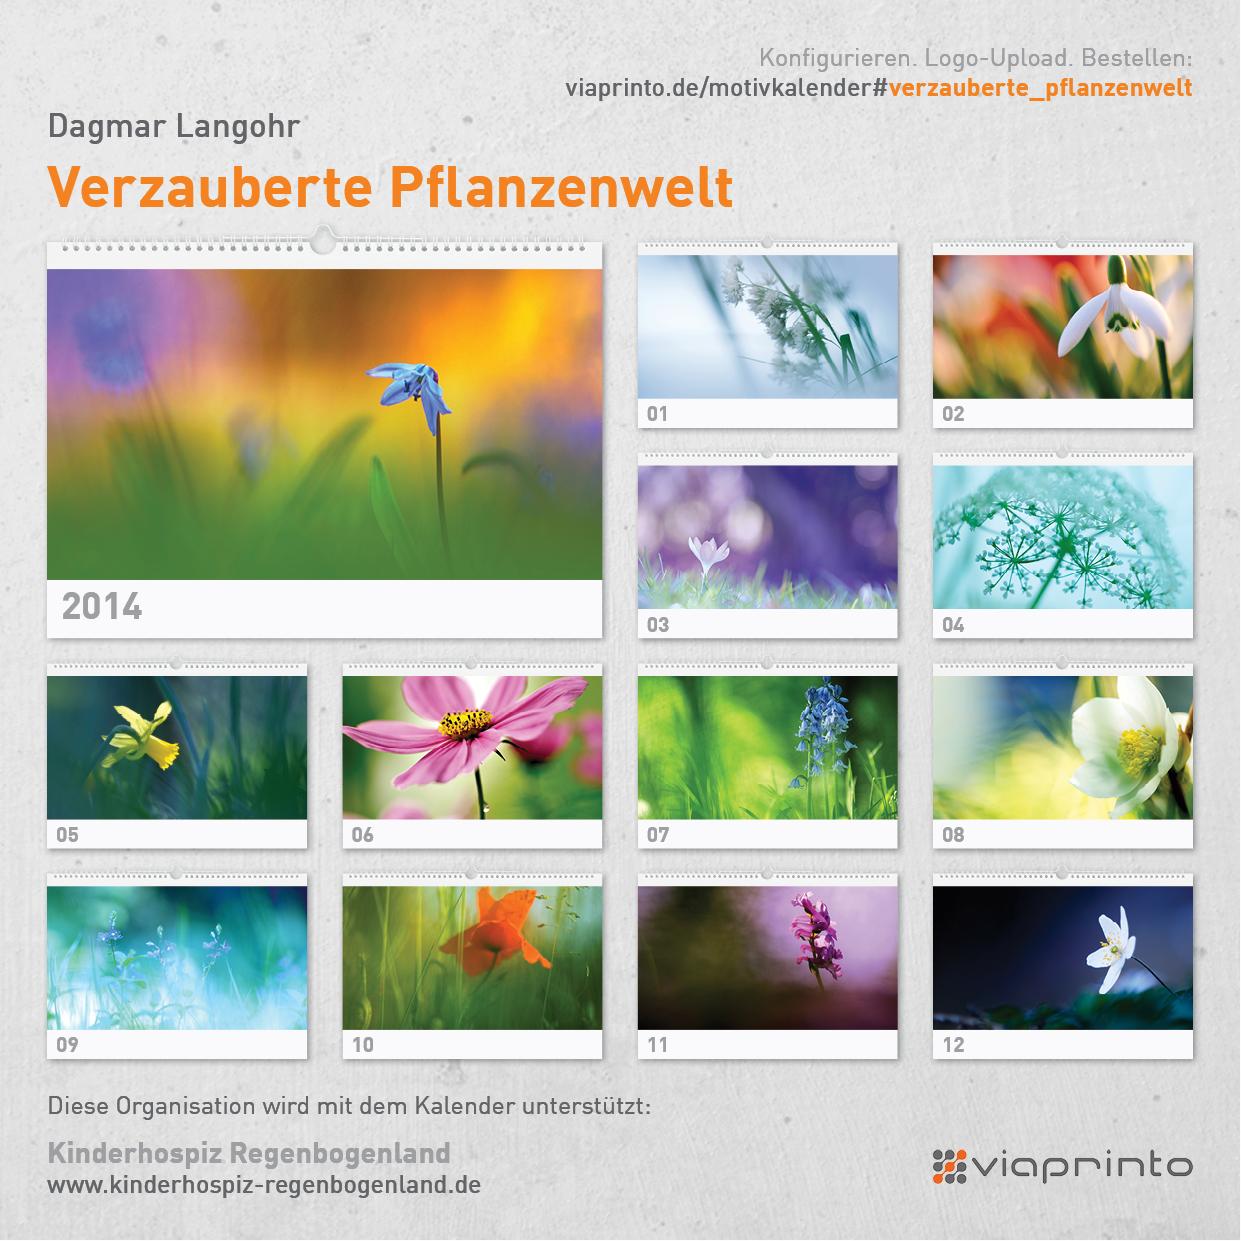 https://www.viaprinto.de/motivkalender#/verzauberte_pflanzenwelt